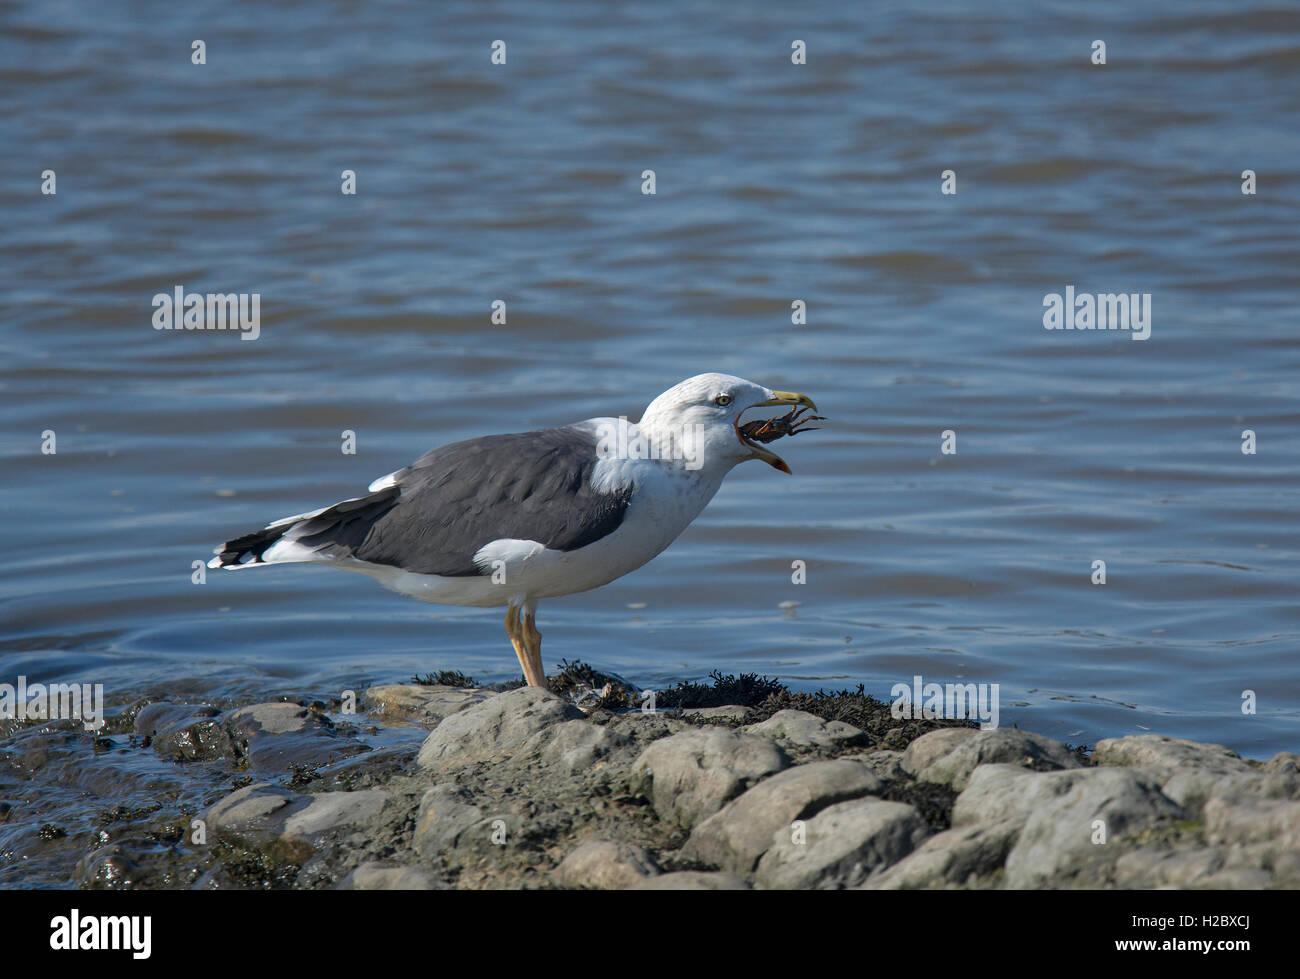 Herring Gull, larus argentatus, swallowing crab, Lancashire, England, UK - Stock Image